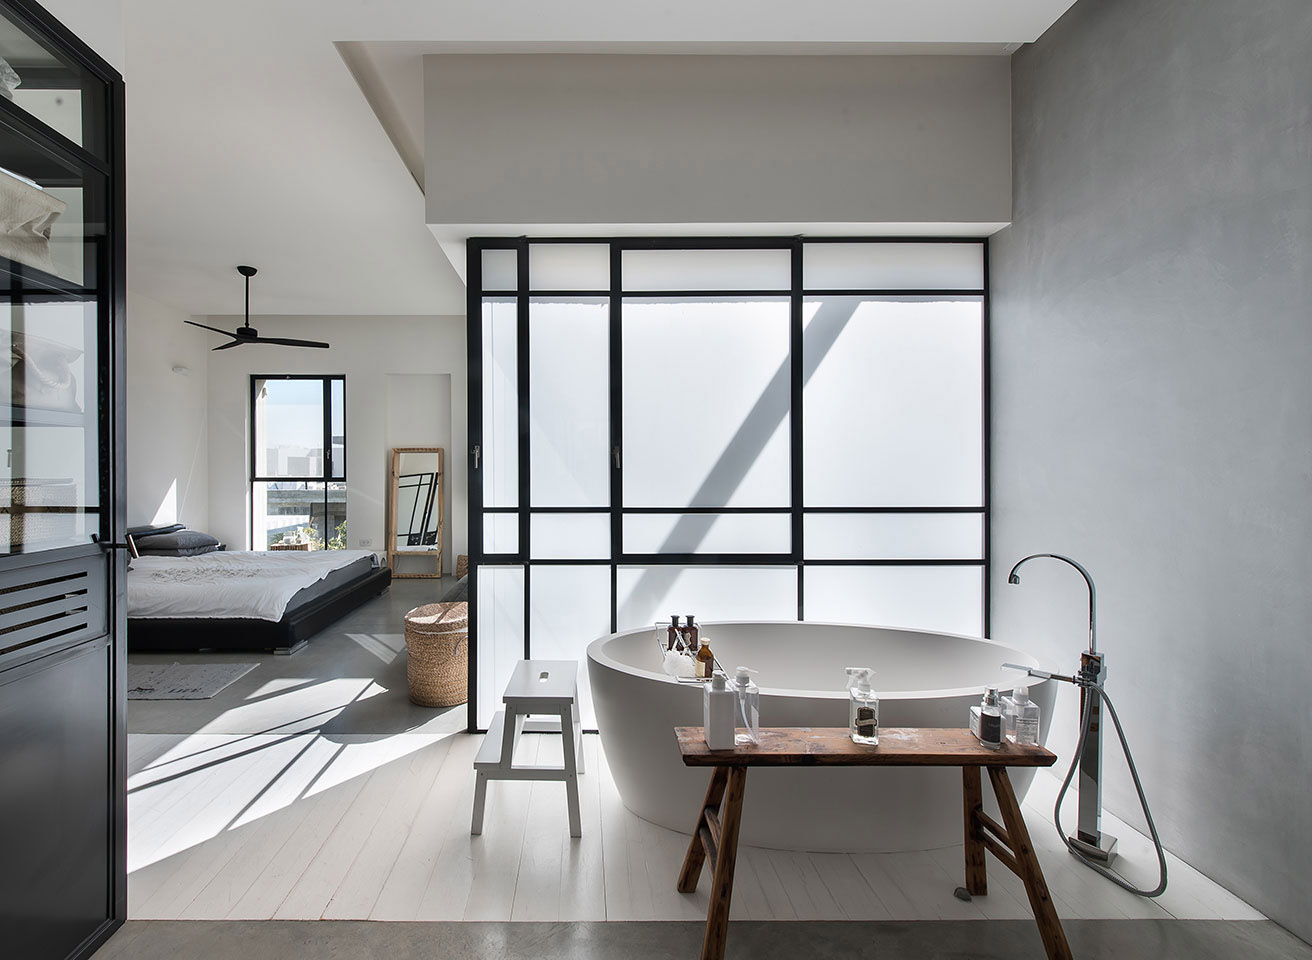 Neuman Hayner Architects